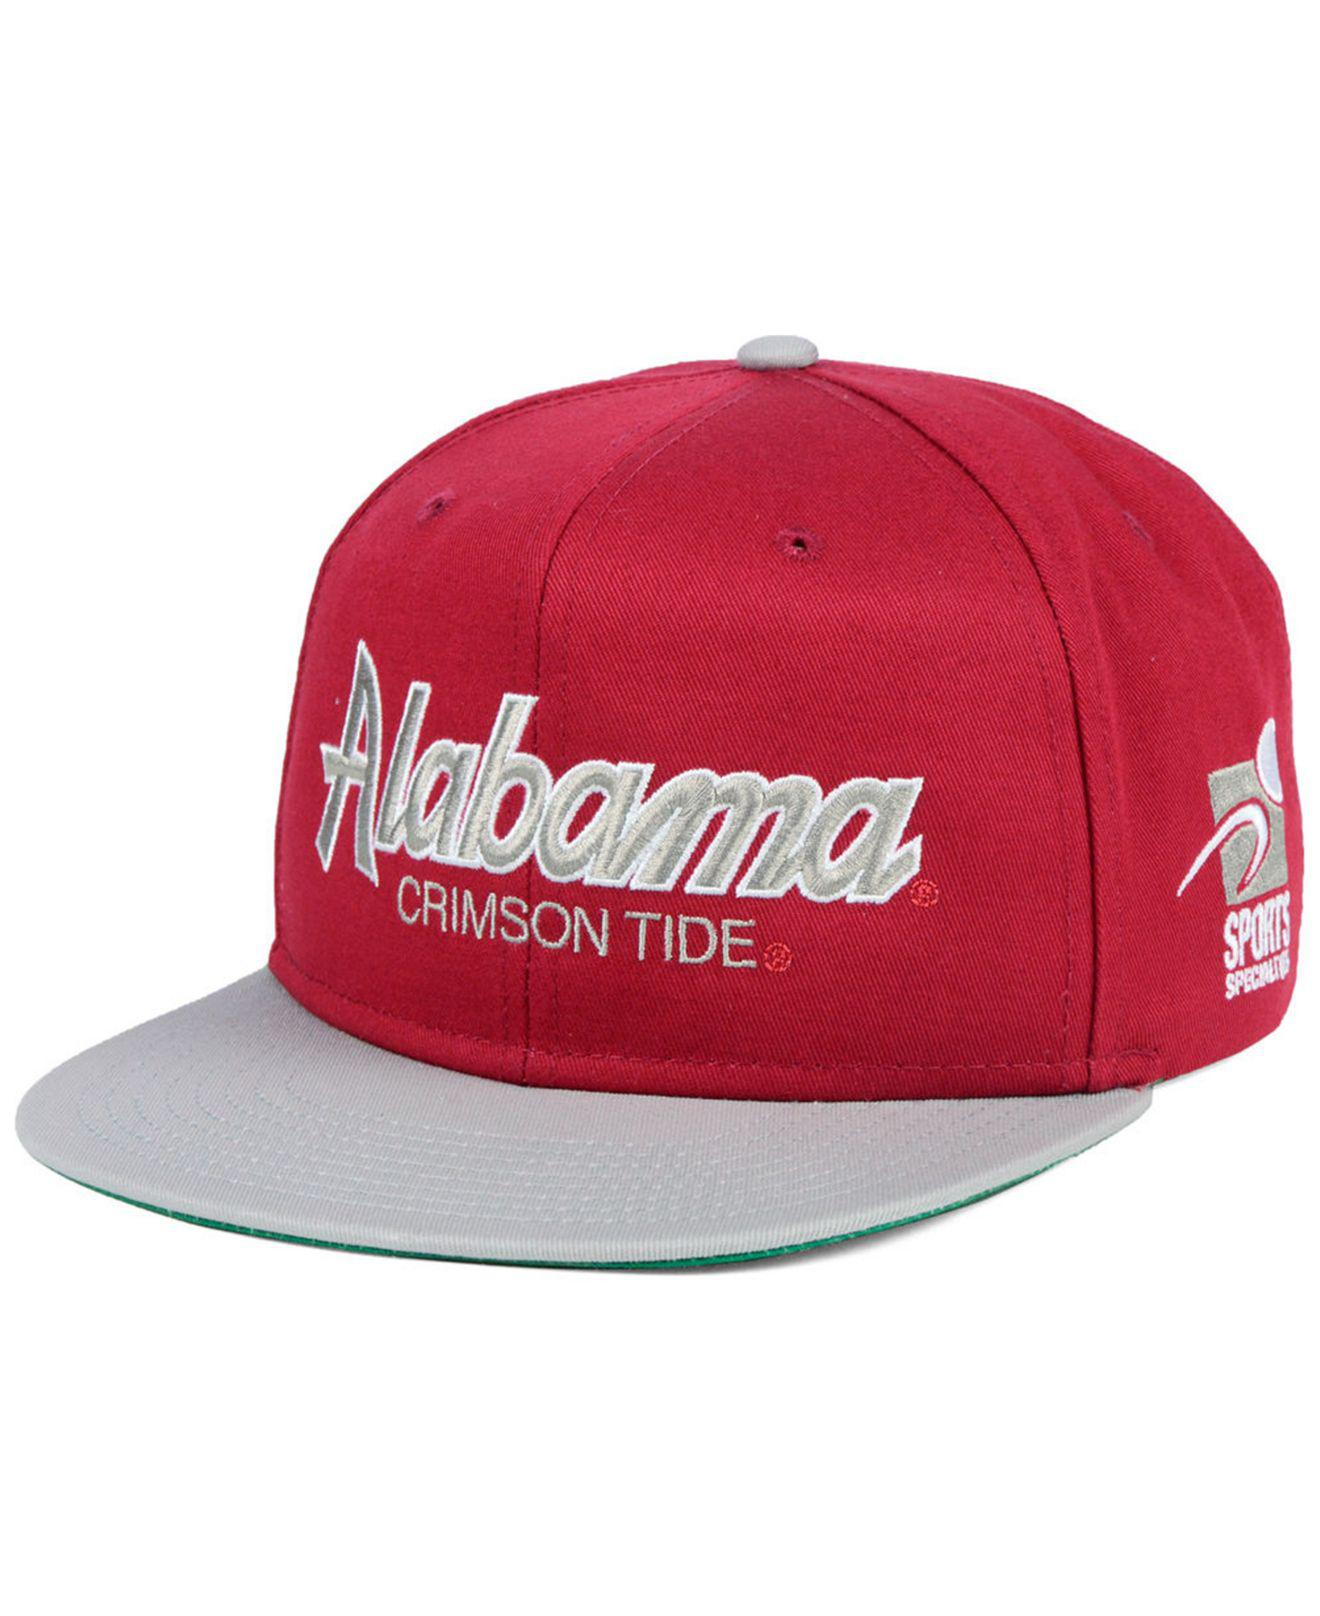 ee6ee25d0f7 Lyst - Nike Alabama Crimson Tide Sport Specialties Snapback Cap in ...